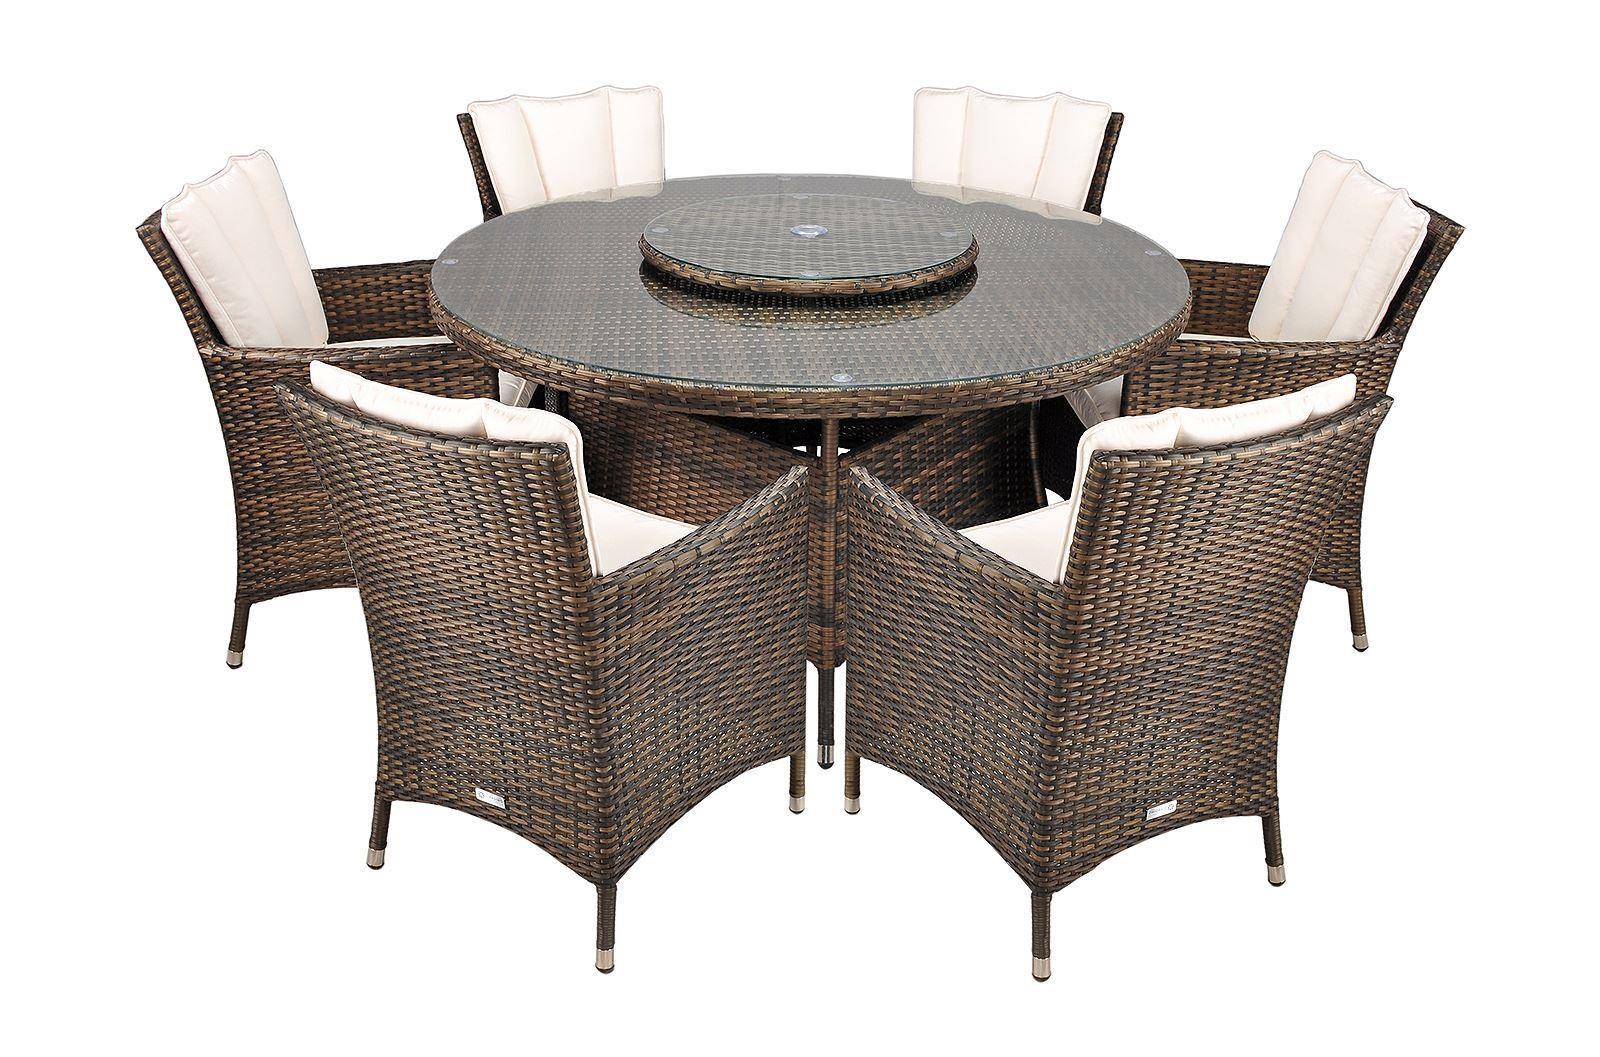 Savannah 6 Seat Rattan Garden Furniture Set